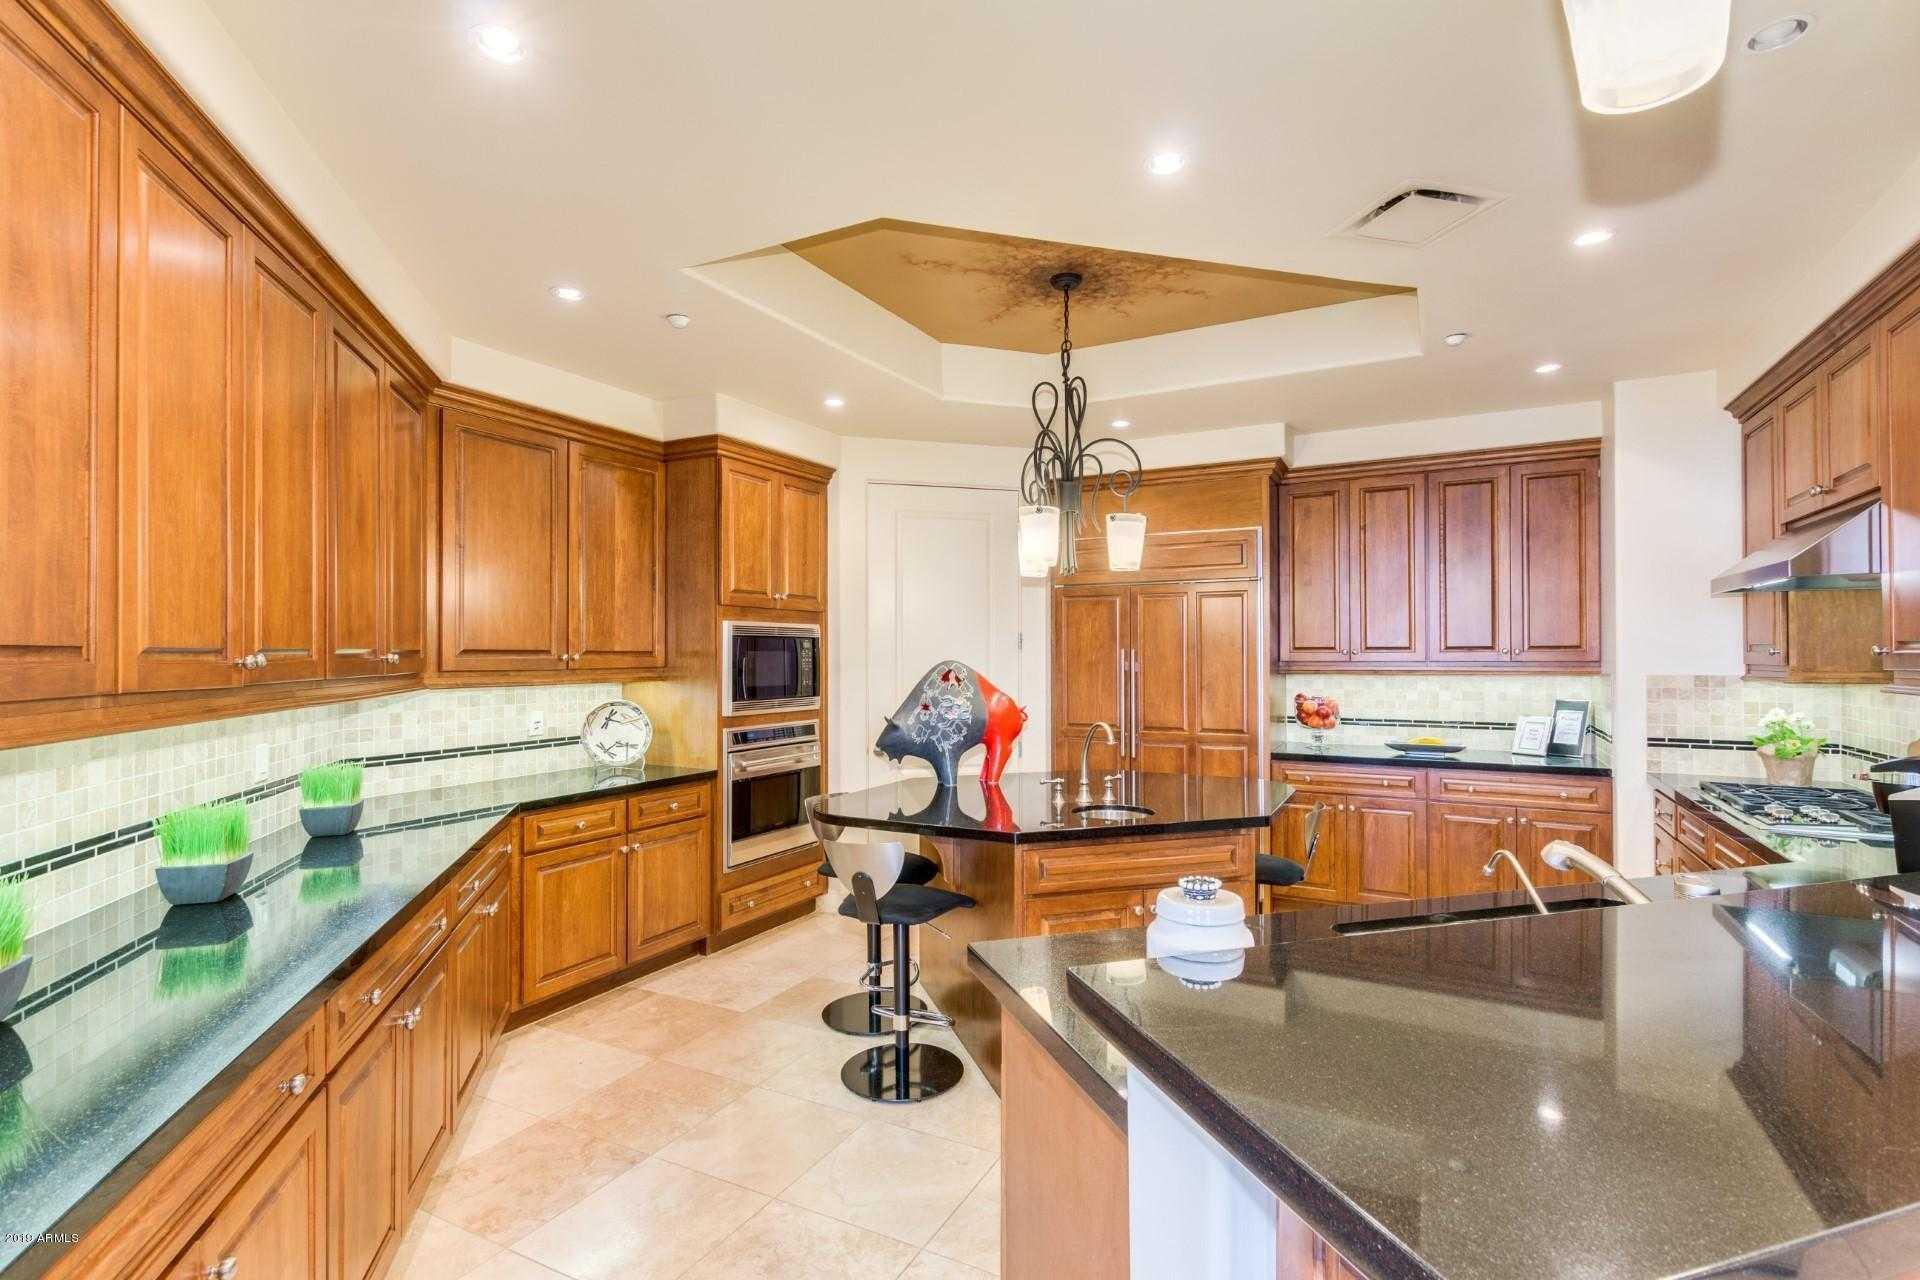 $1,350,000 - 4Br/4Ba -  for Sale in Landmark, Scottsdale